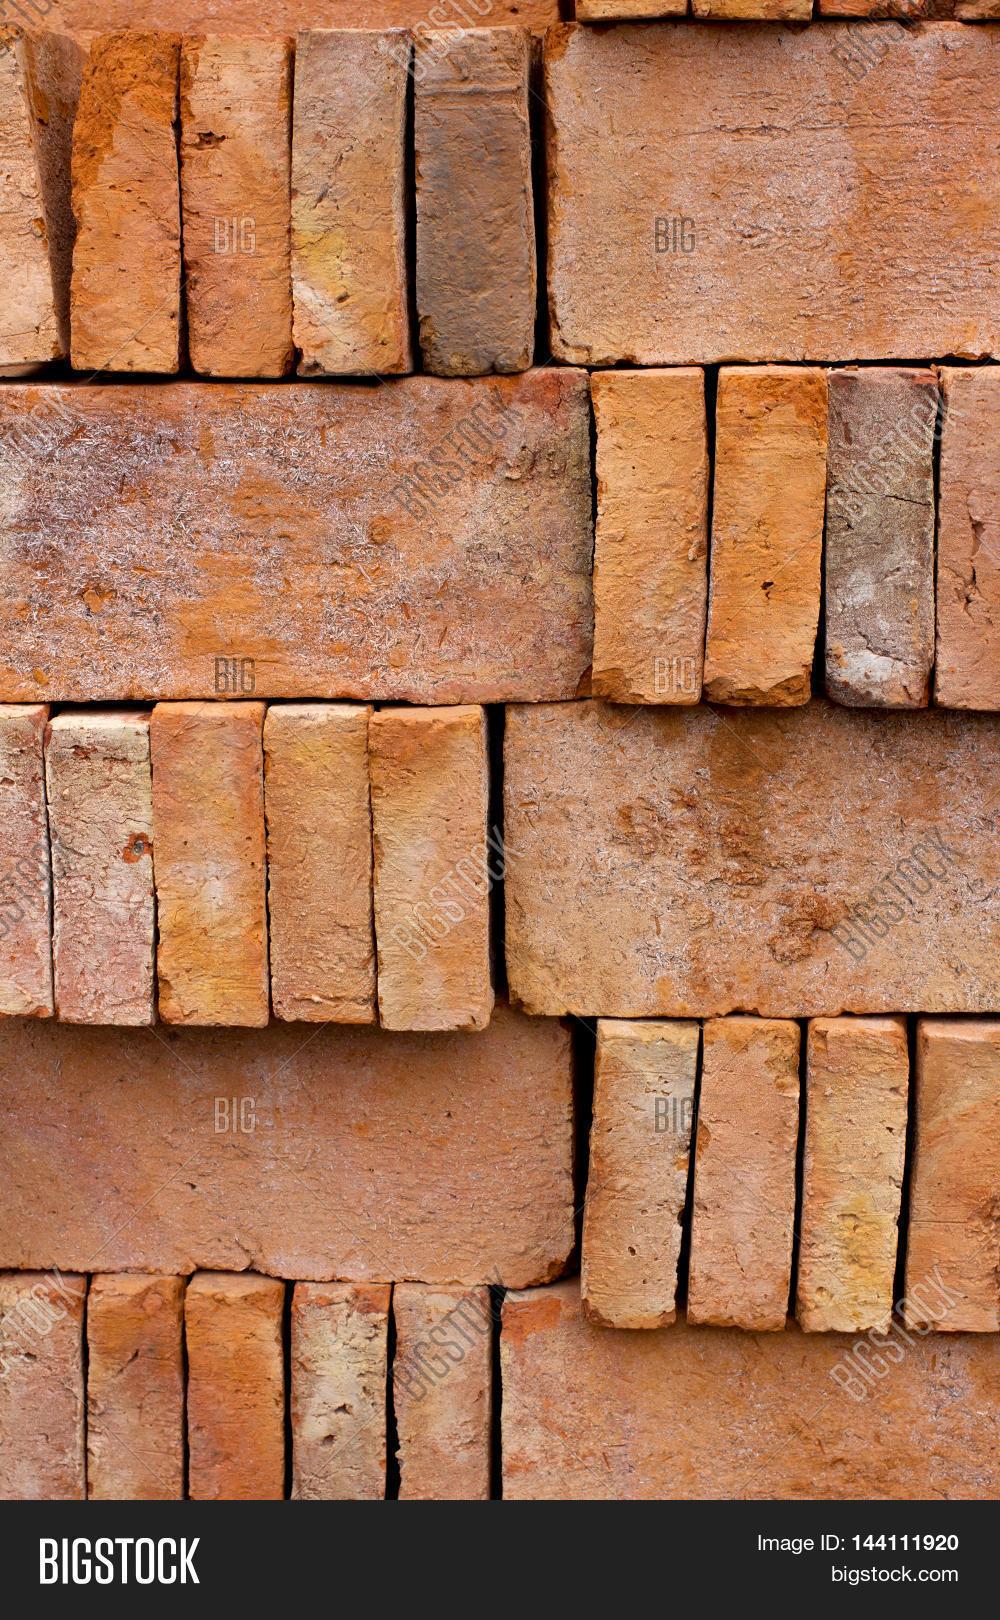 new red brick pavers